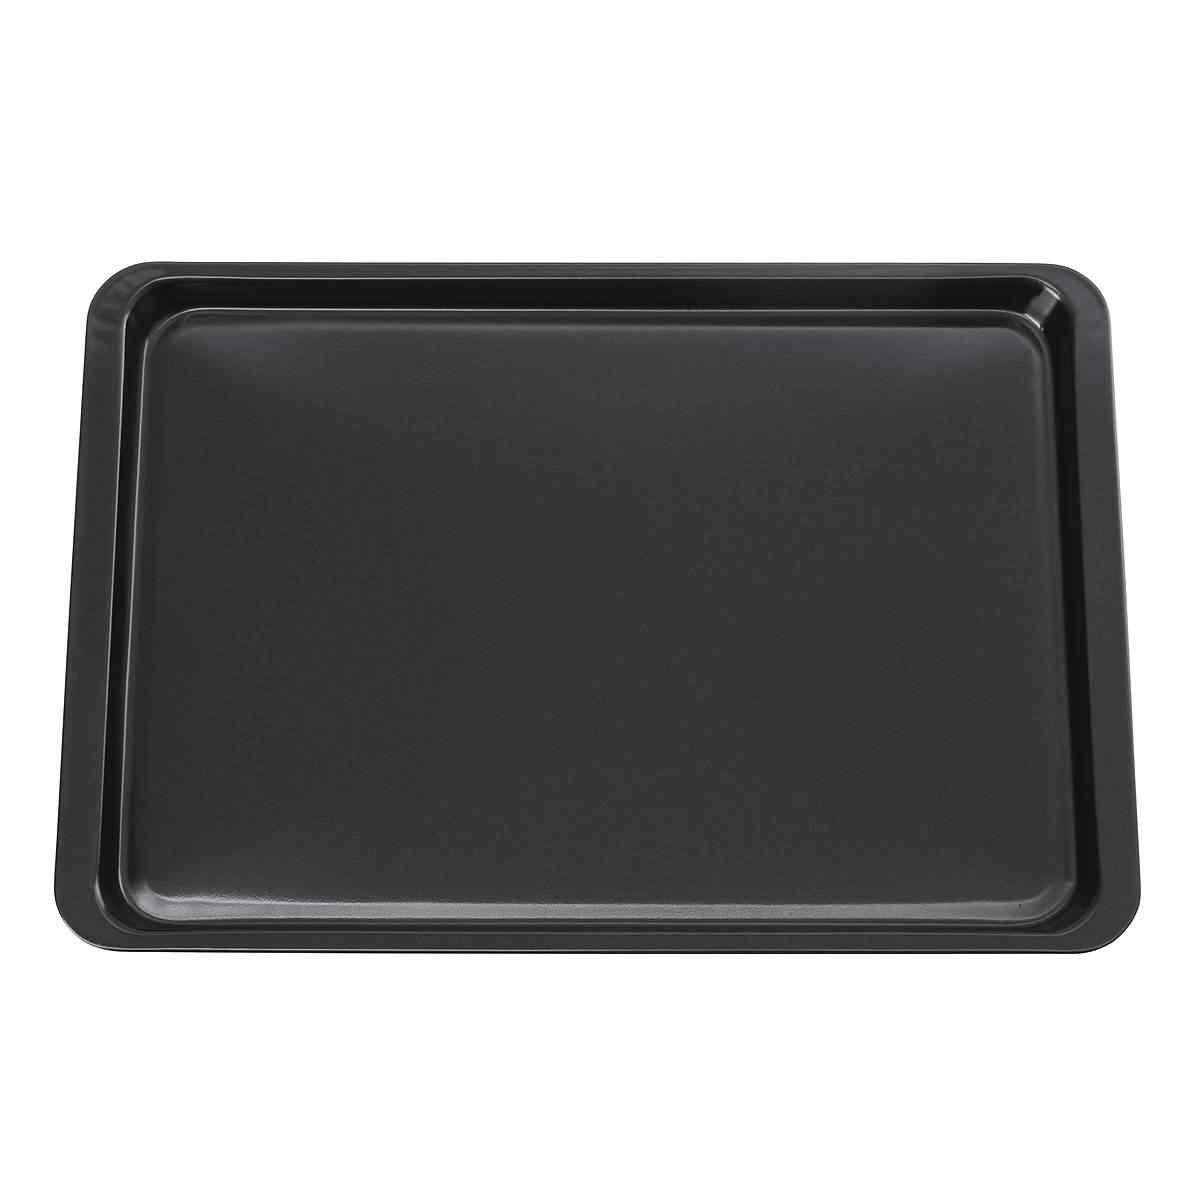 Rectangular Carbon Steel Non Stick Bread Cake Baking Tray